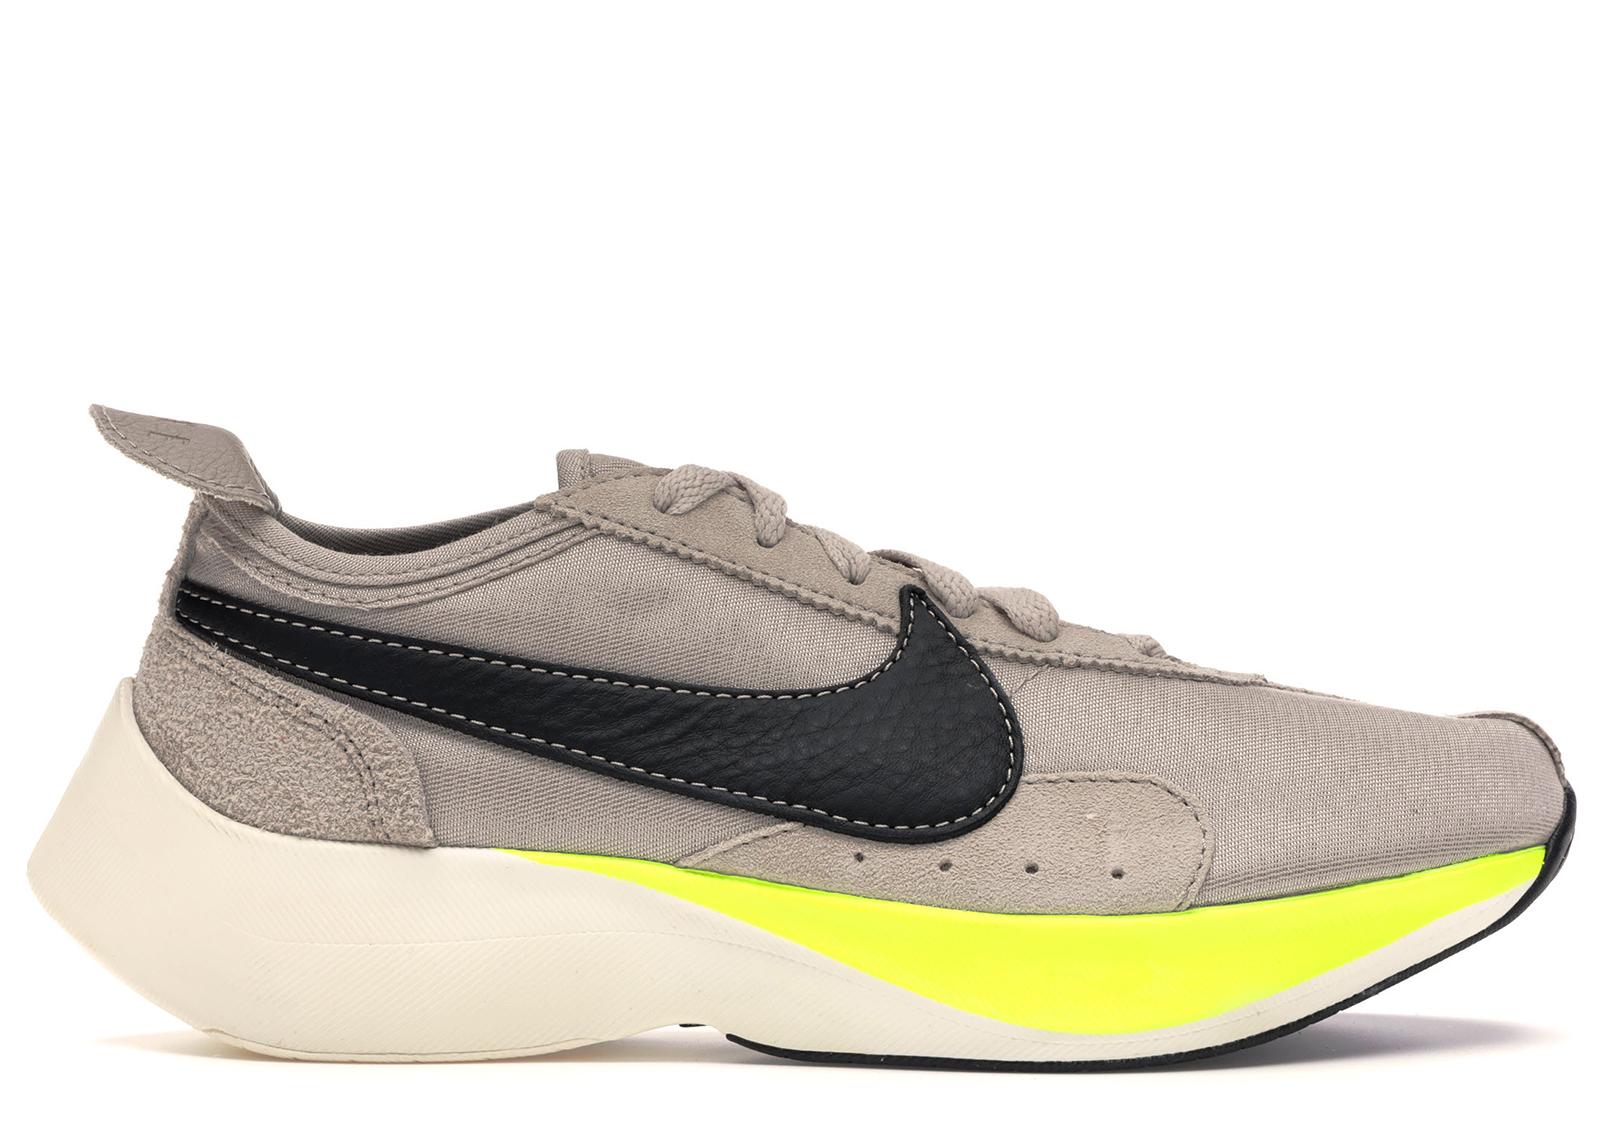 Nike Moon Racer String - AQ4121-200